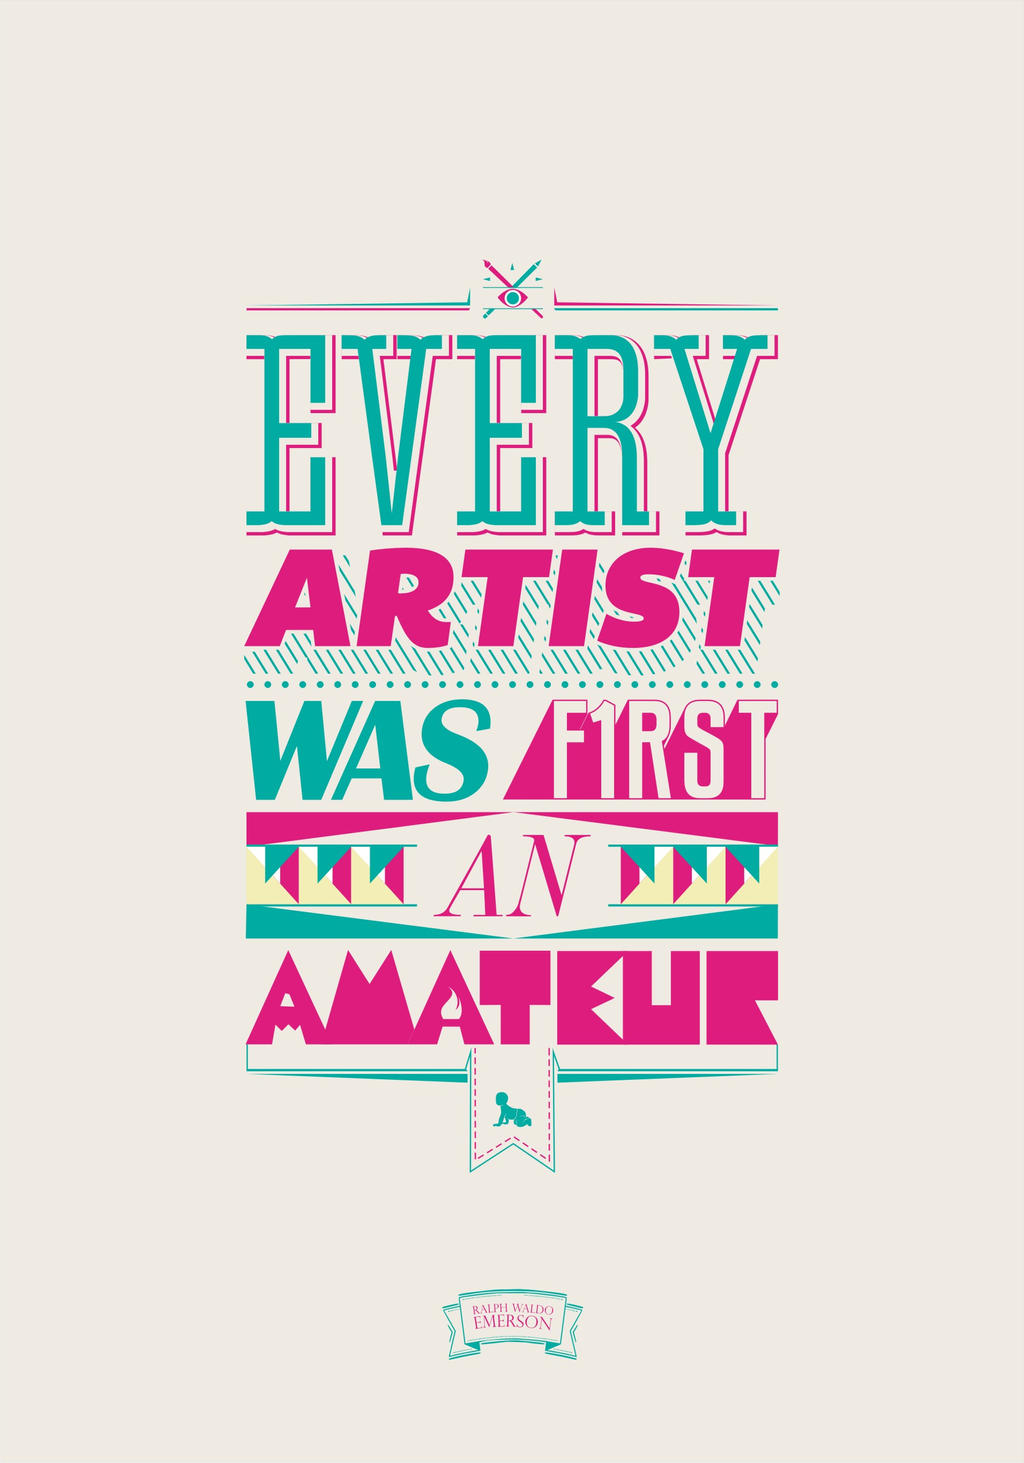 Every Artist Ver. 2 by MrCarik